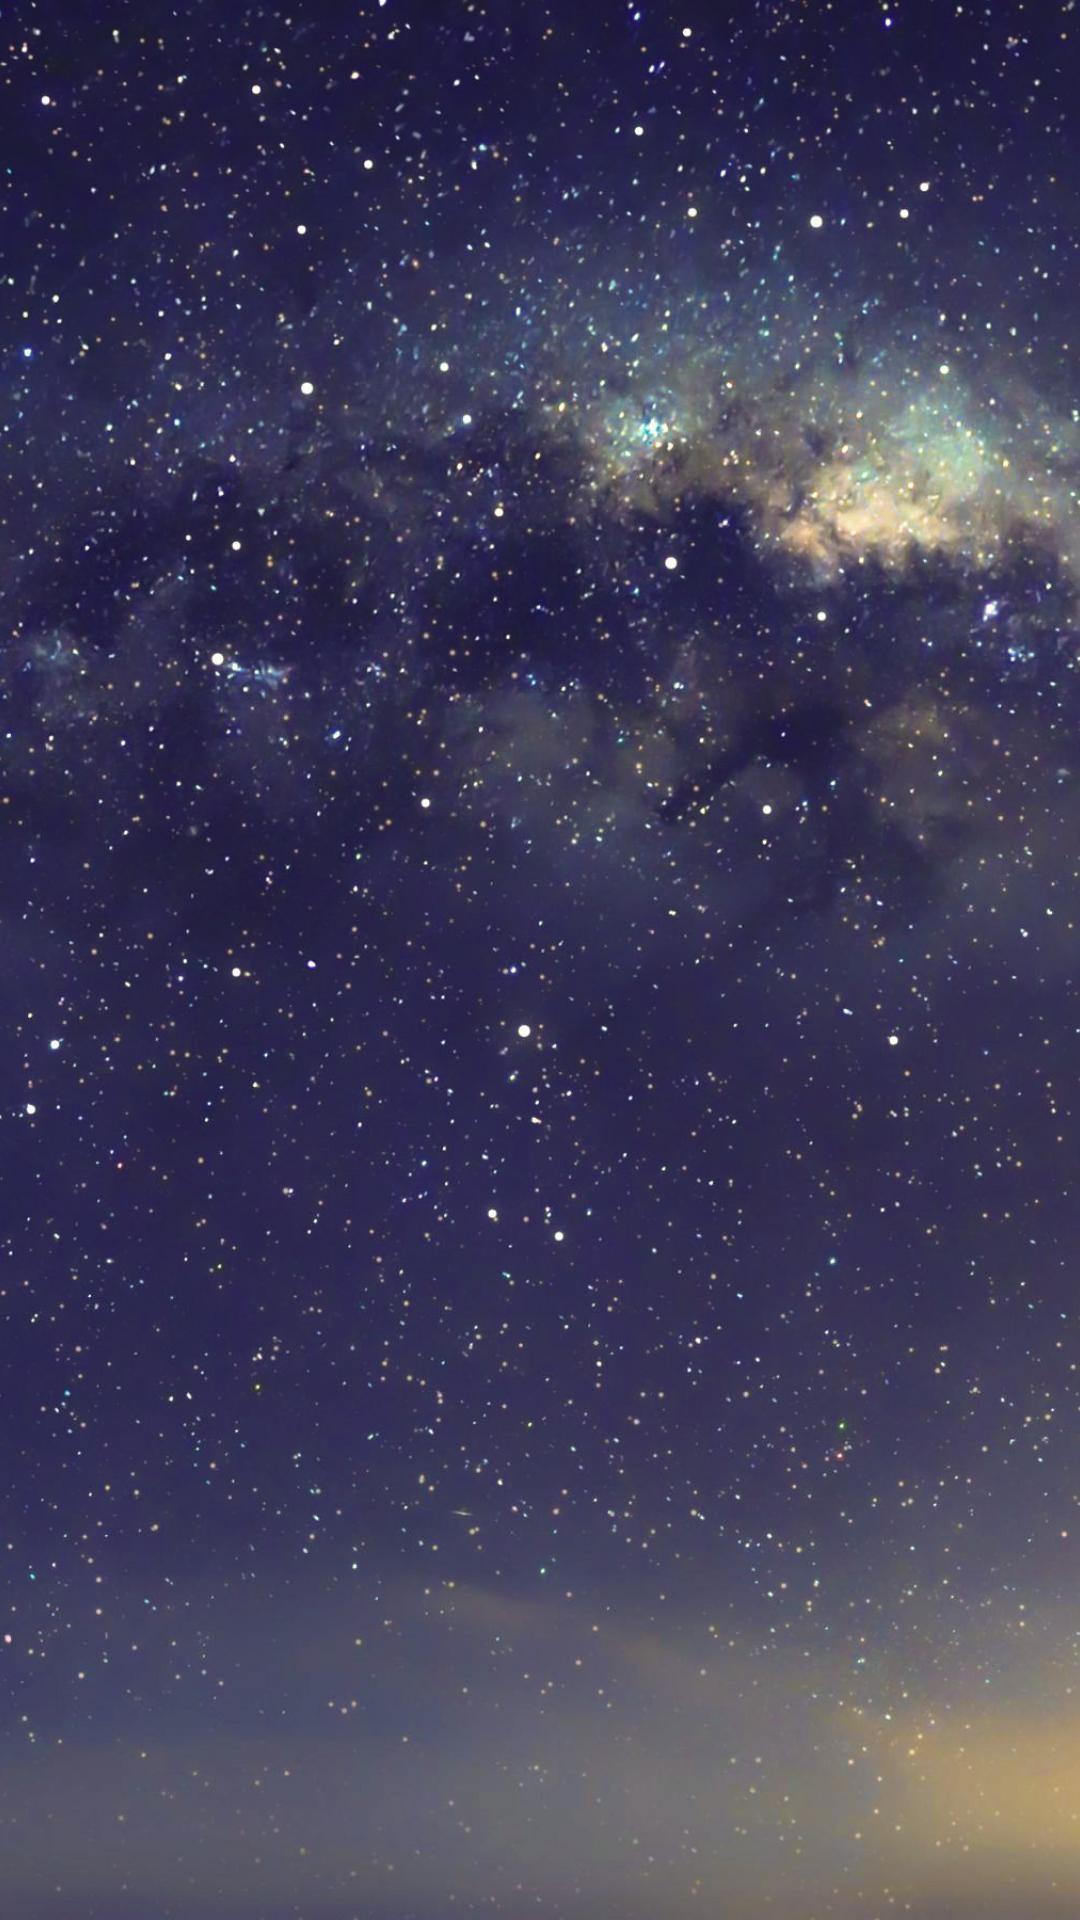 Iphone 6 Plus Space Stars Iphone 6 Plus Wallpaper